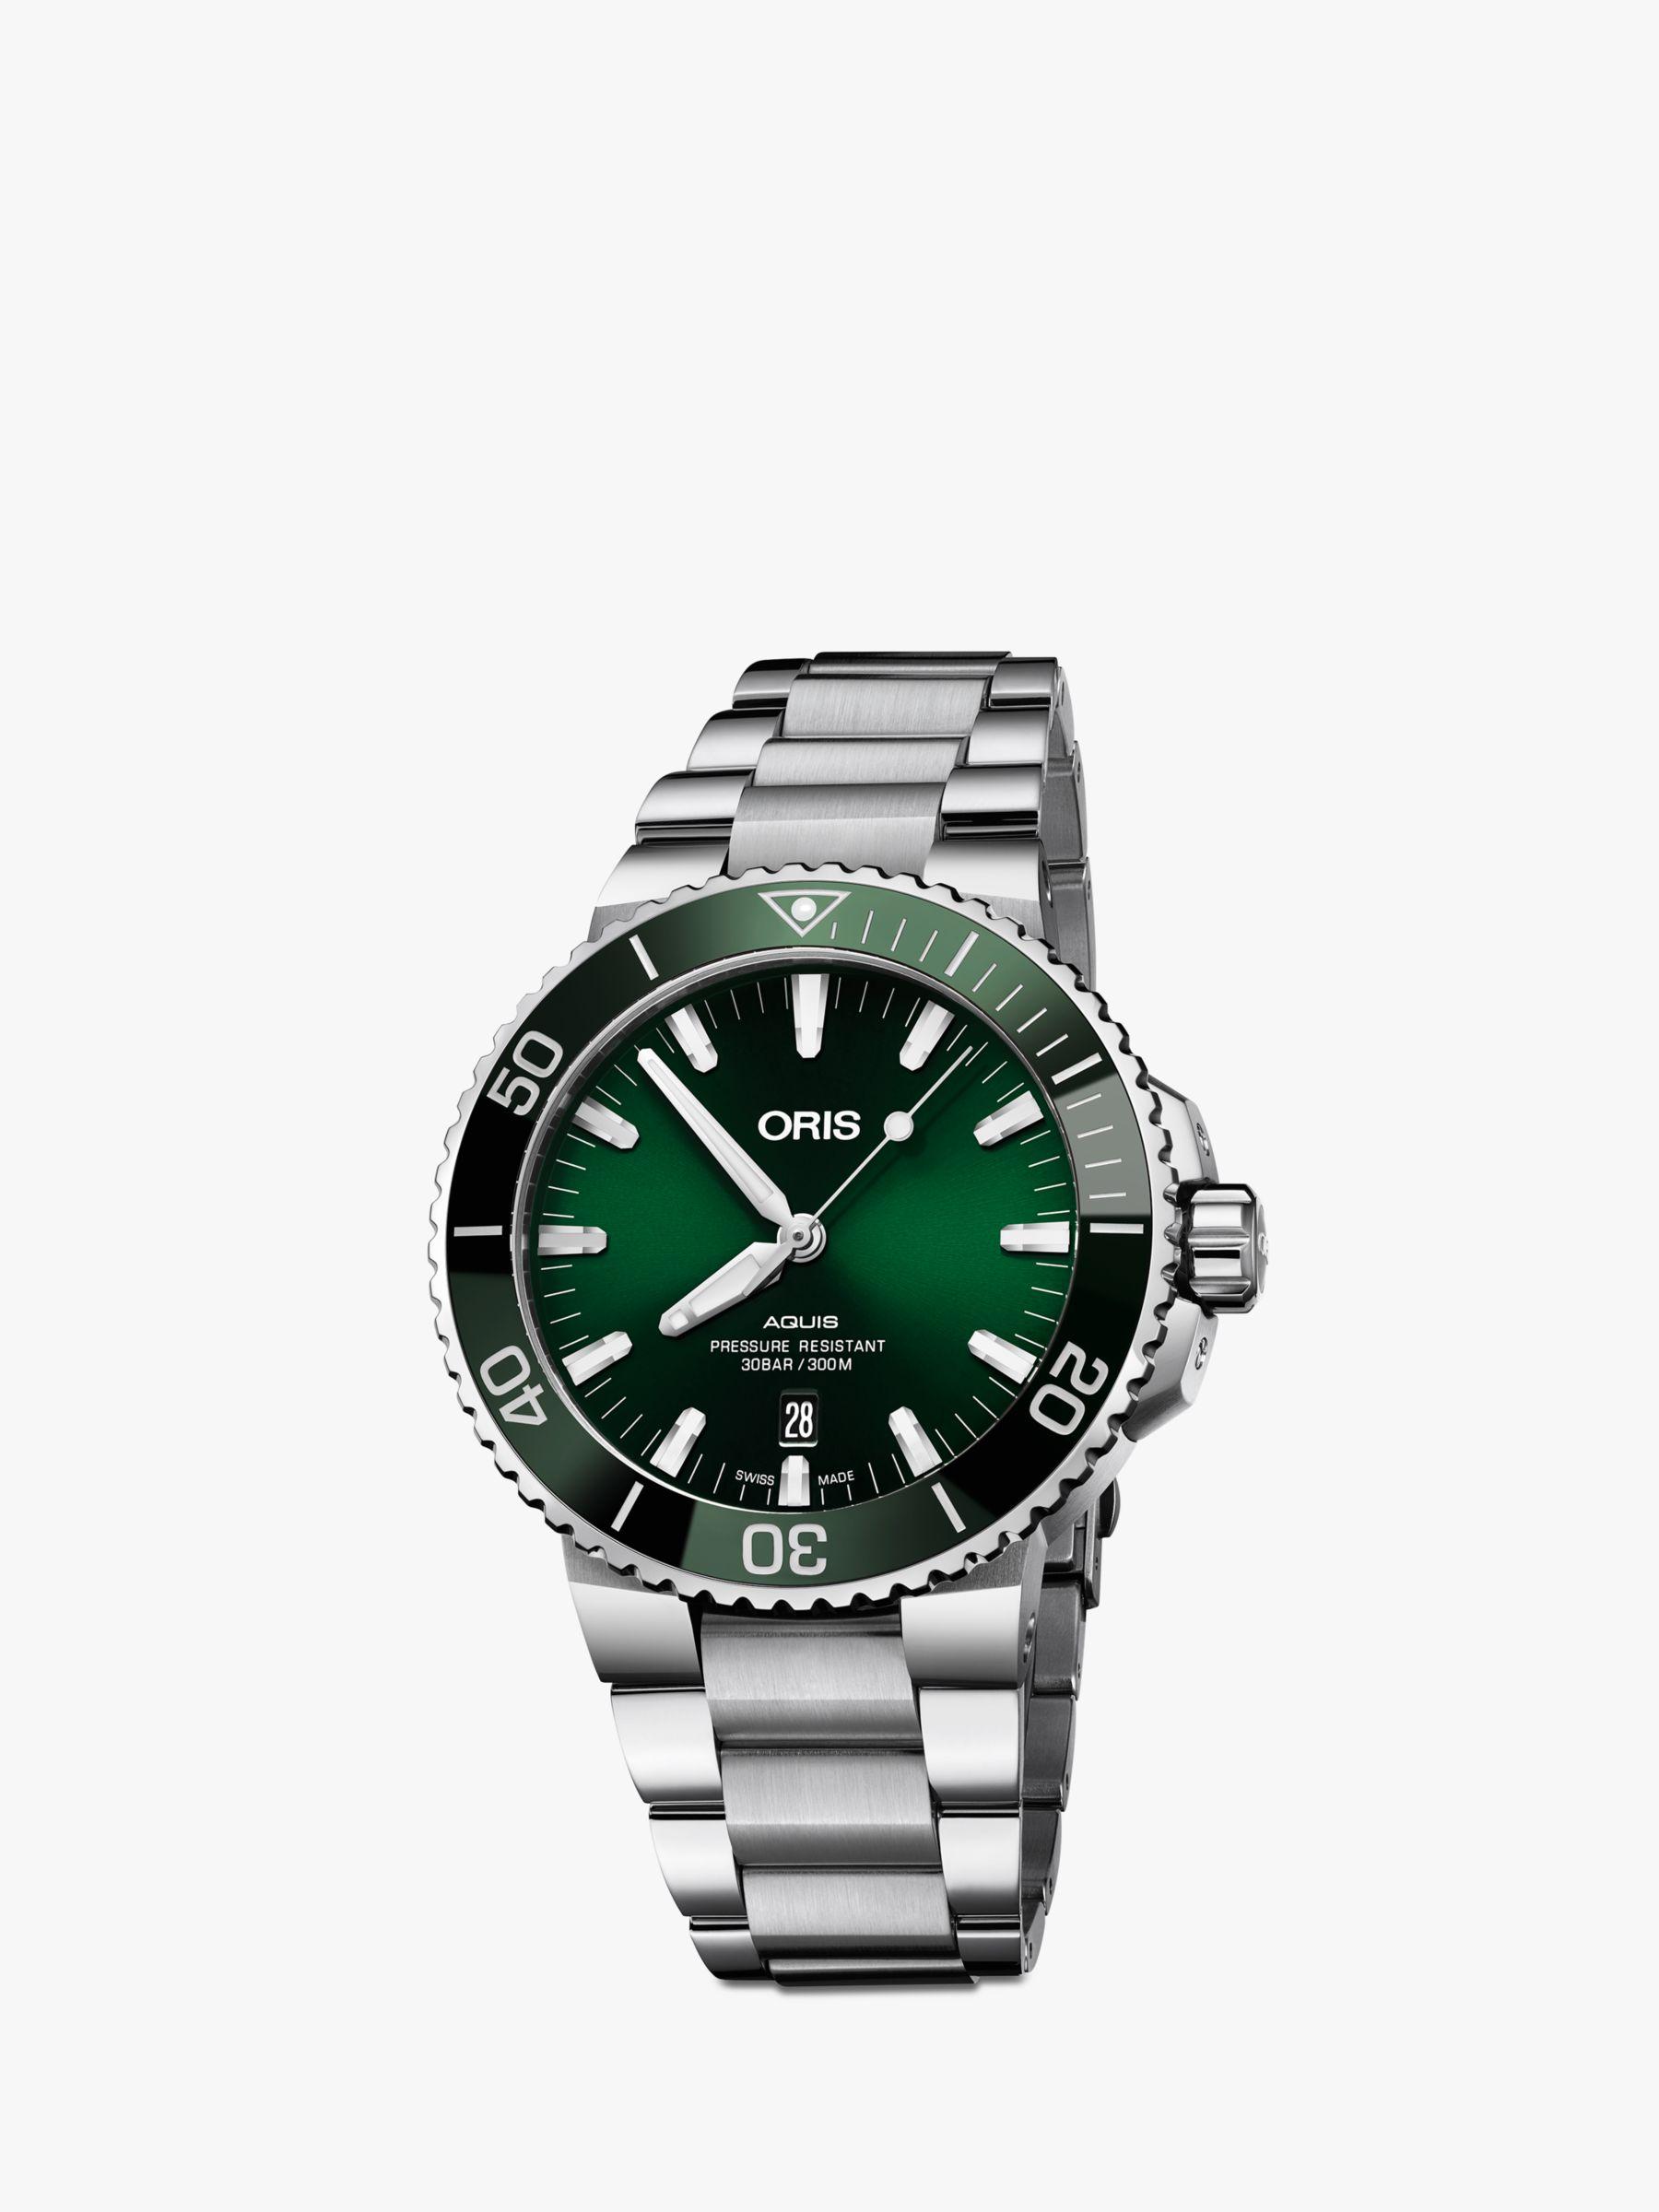 Oris Oris 01 733 7730 4157-07 8 24 05PEB Men's Aquis Date Bracelet Strap Watch, Silver/Green